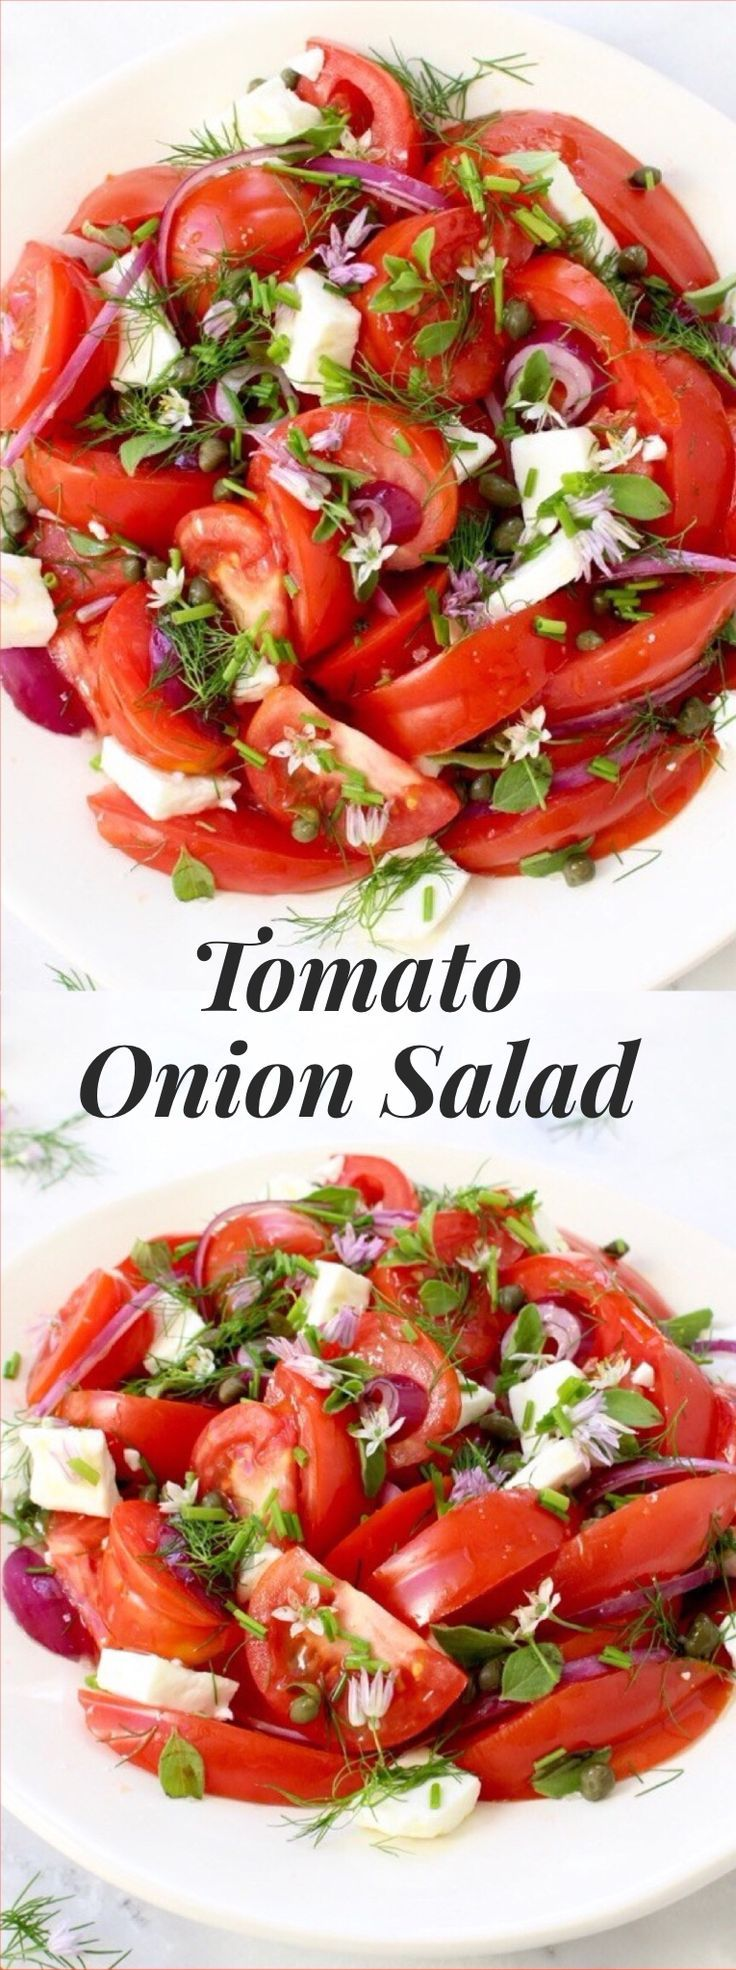 Tomato Onion Salad Recipe   http://CiaoFlorentina.com @CiaoFlorentina